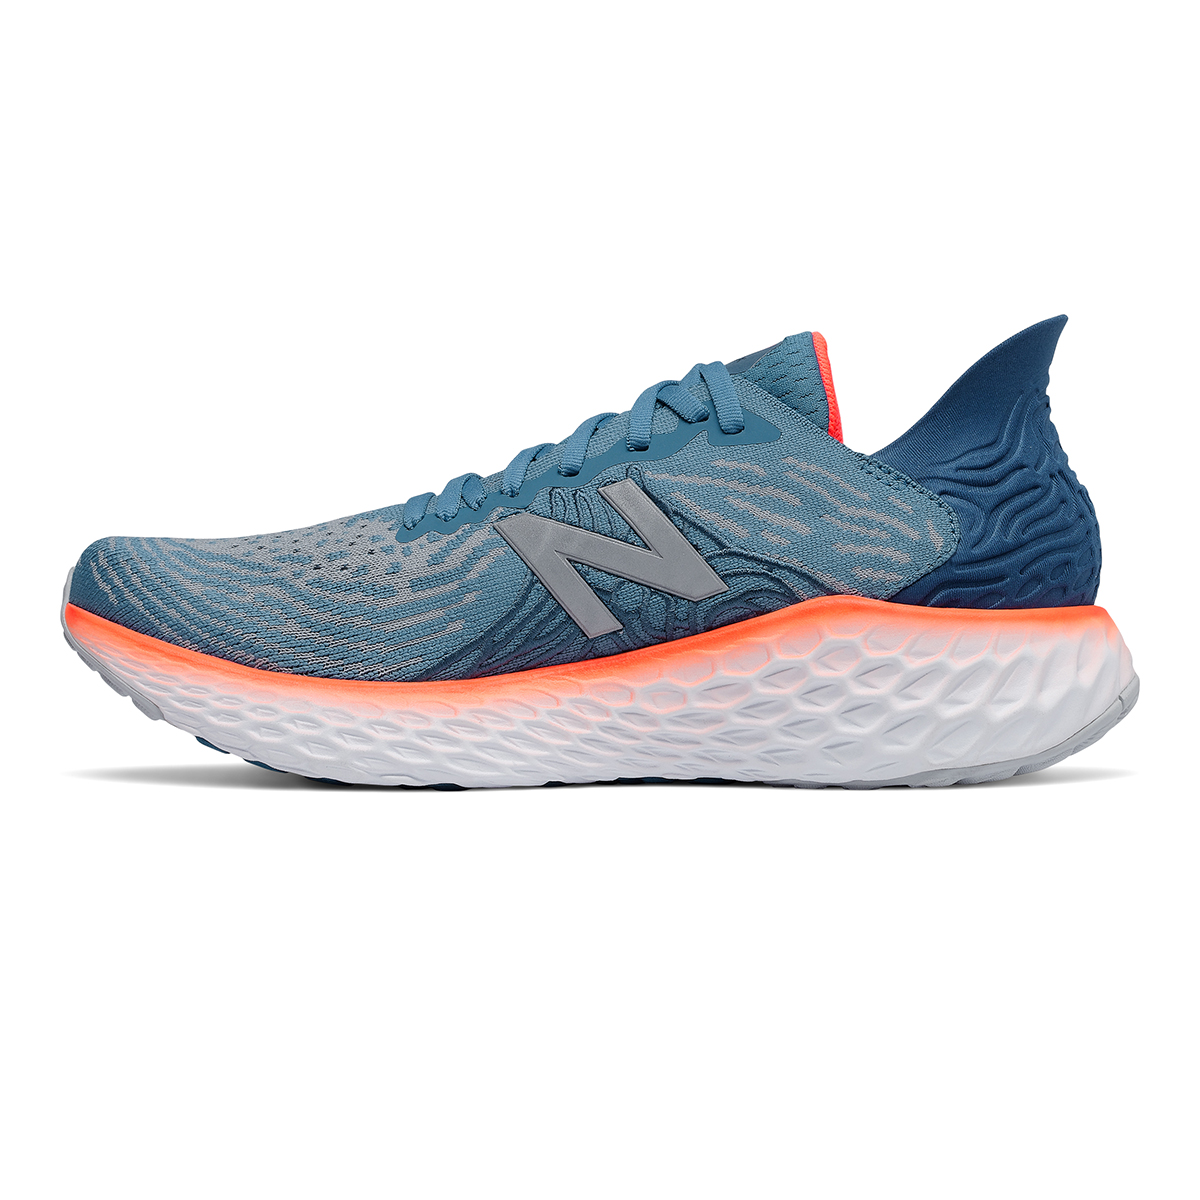 Men's New Balance Fresh Foam 1080v10 Running Shoe - Color: Light Blue - Size: 7 - Width: Regular, Light Blue, large, image 2